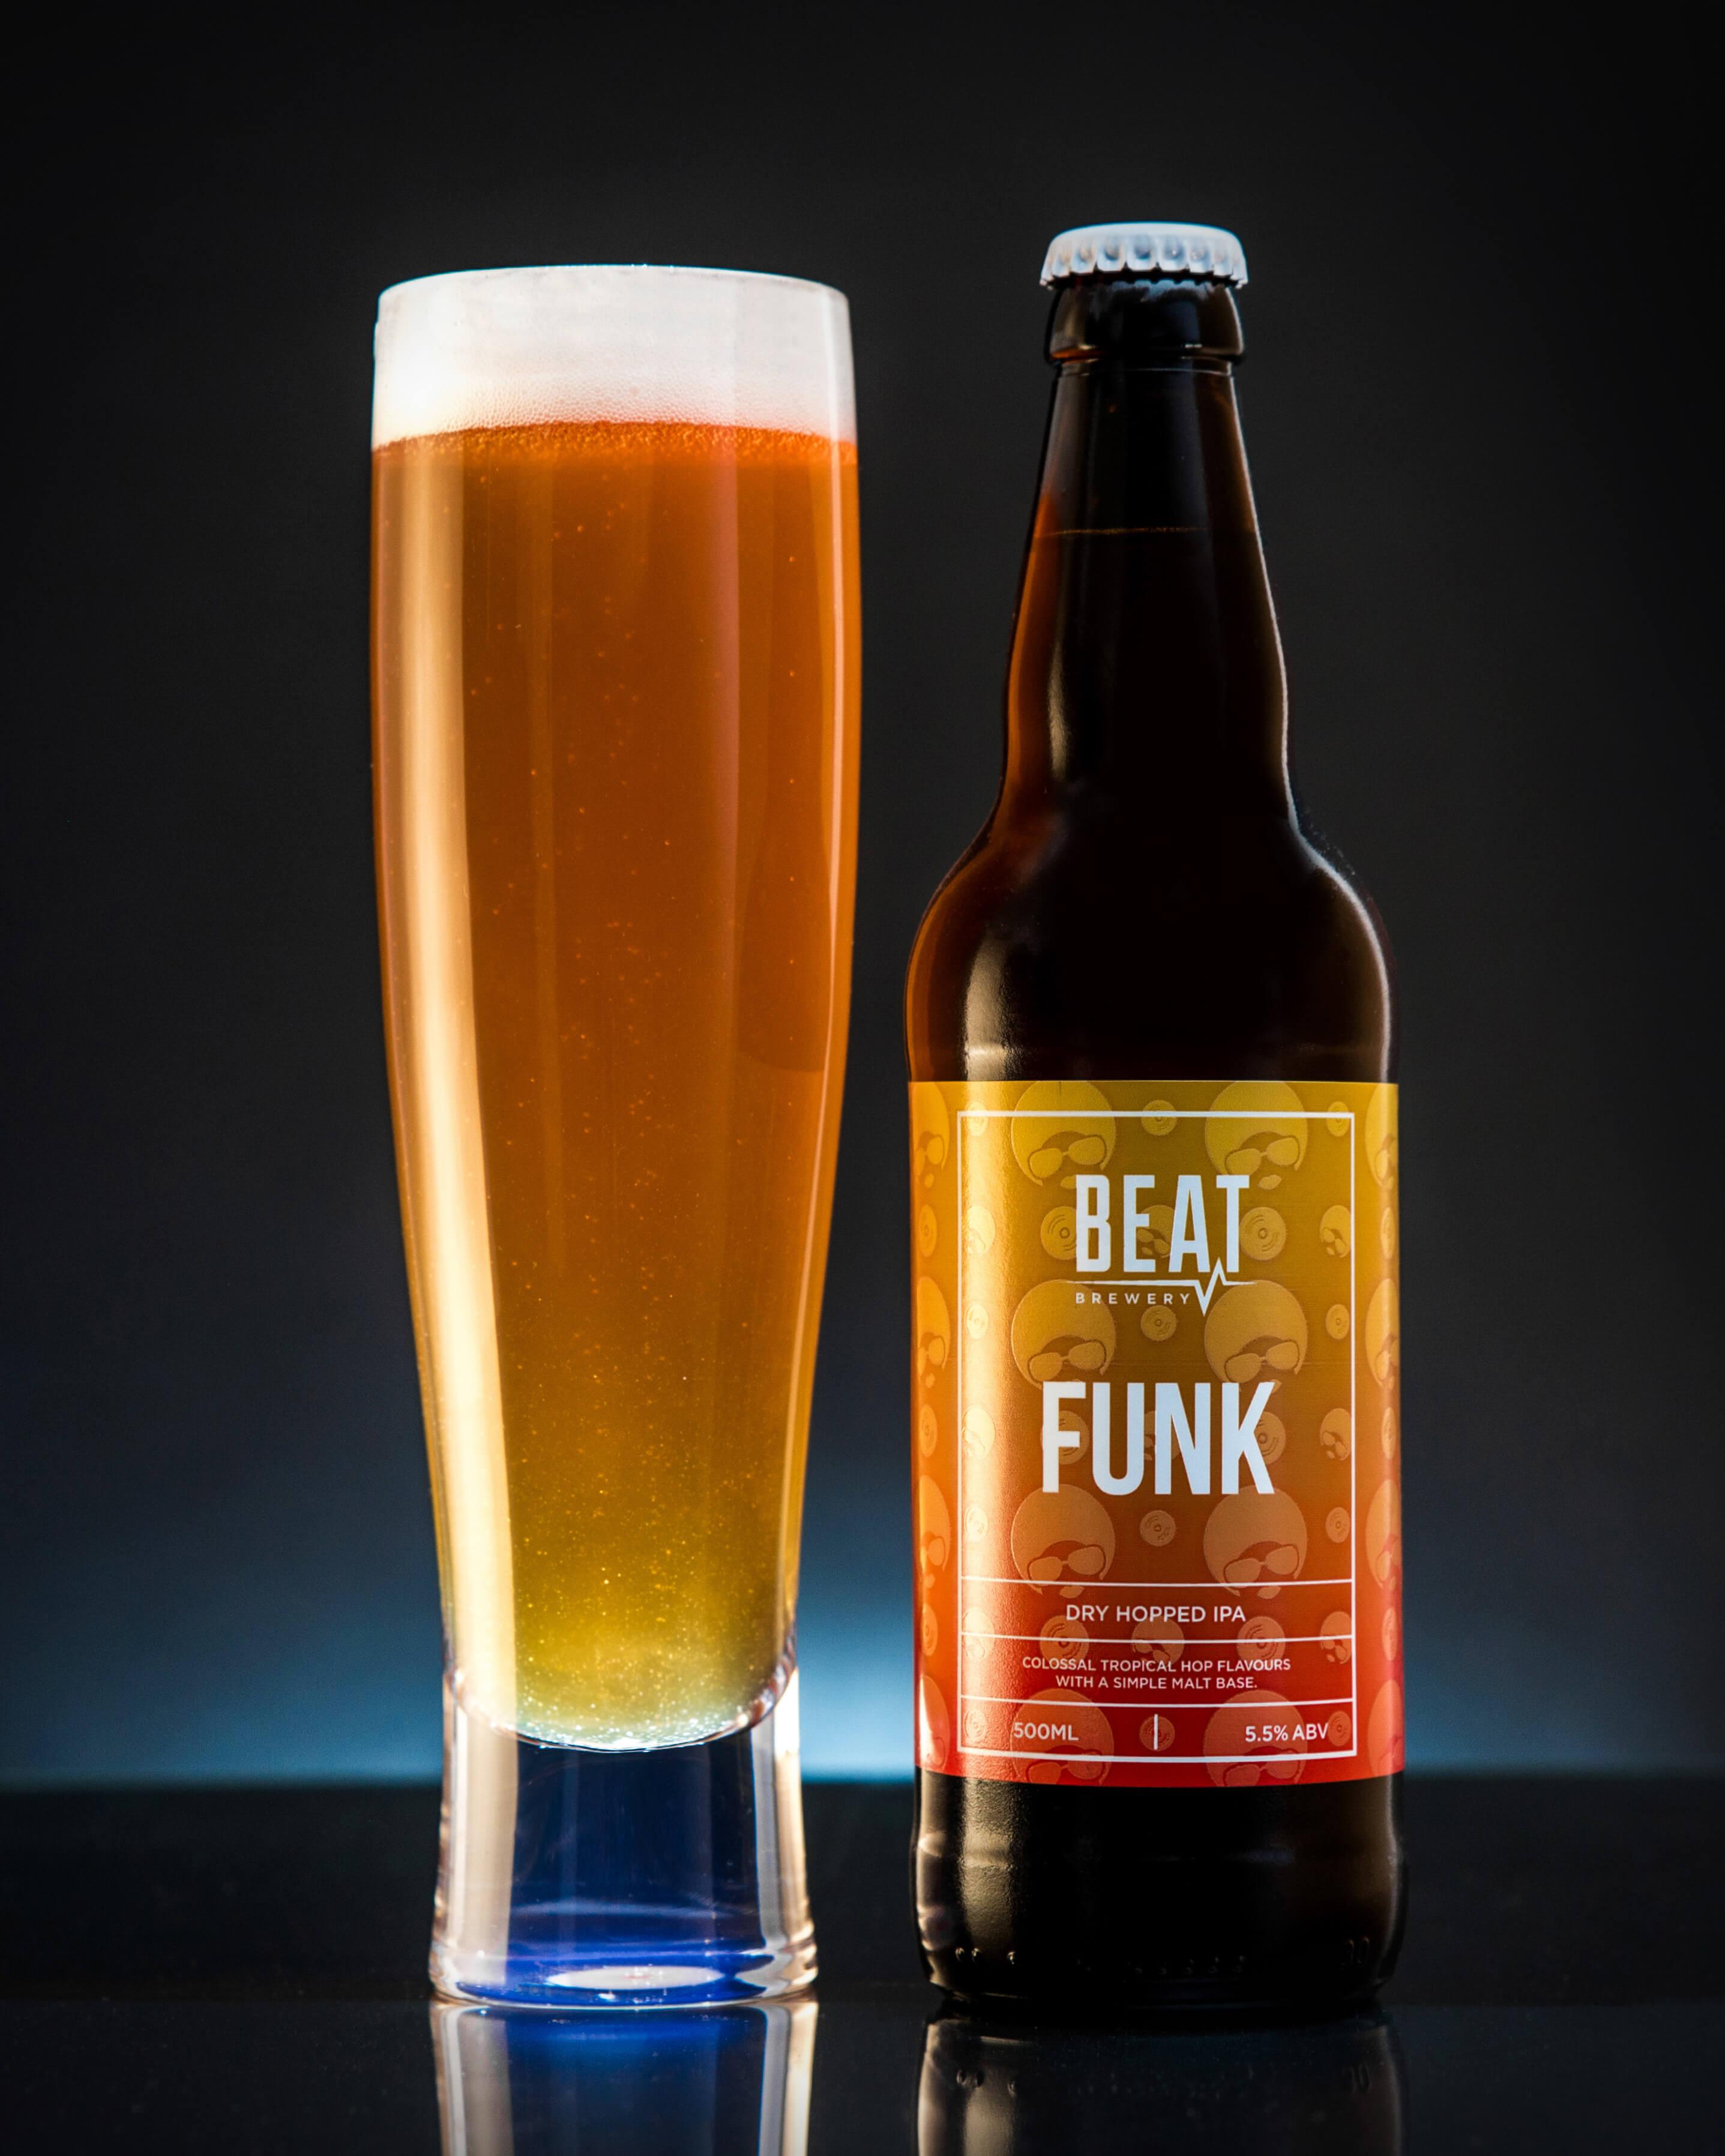 Beat Brewery